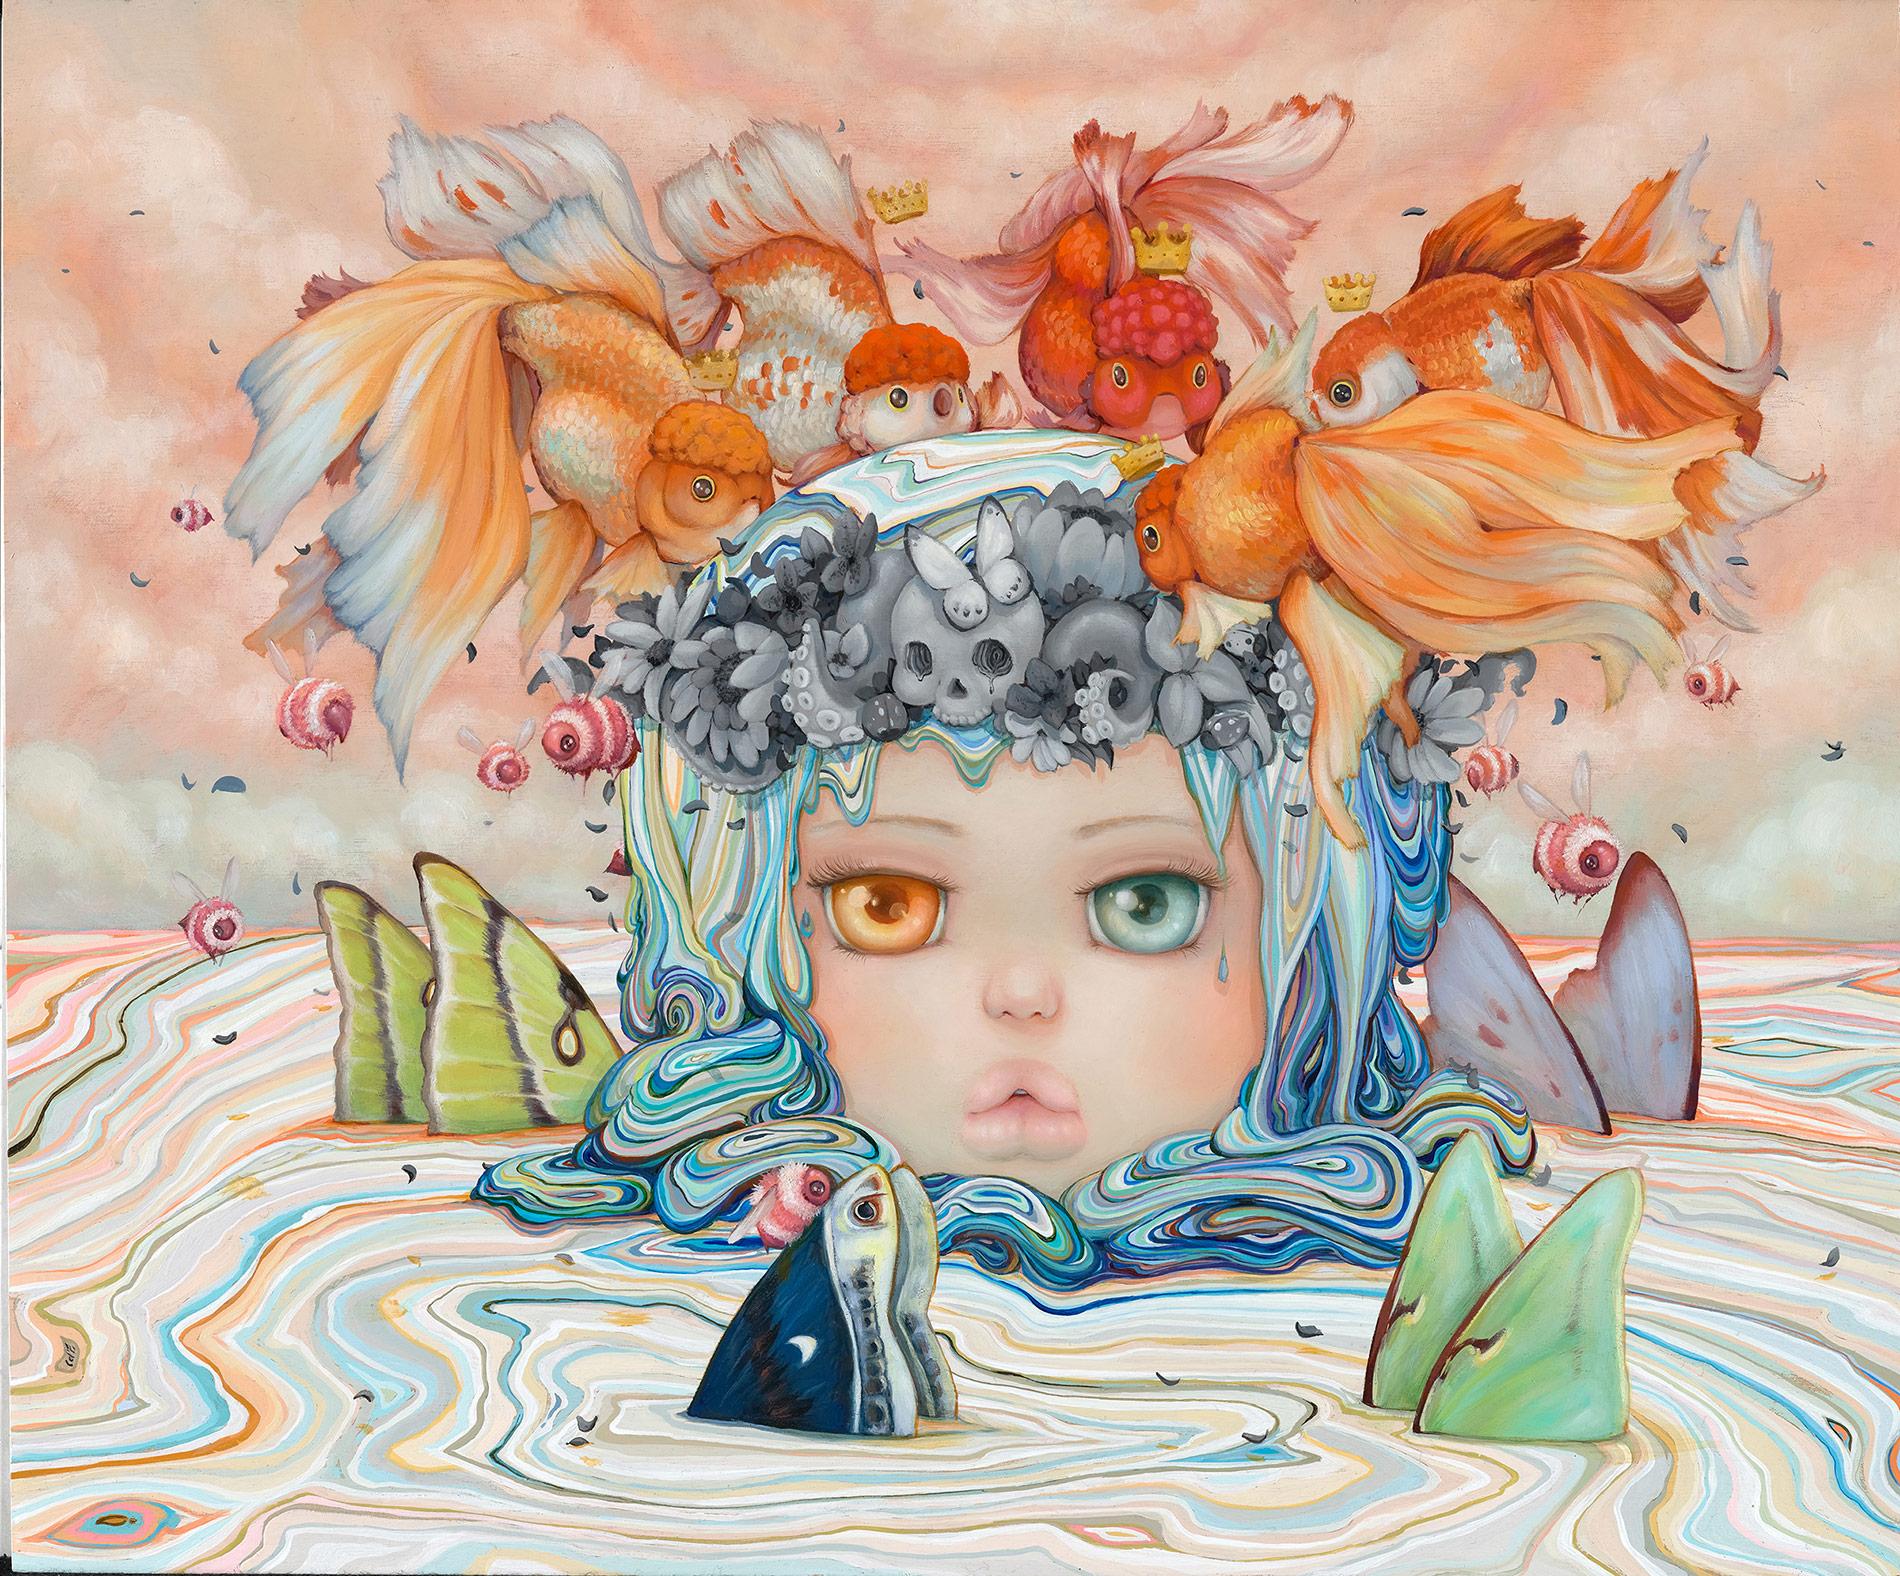 camilla-d'errico-urban-contemporary-painter-illustrator-character-creator-comic-vancouver--la-madre.jpg